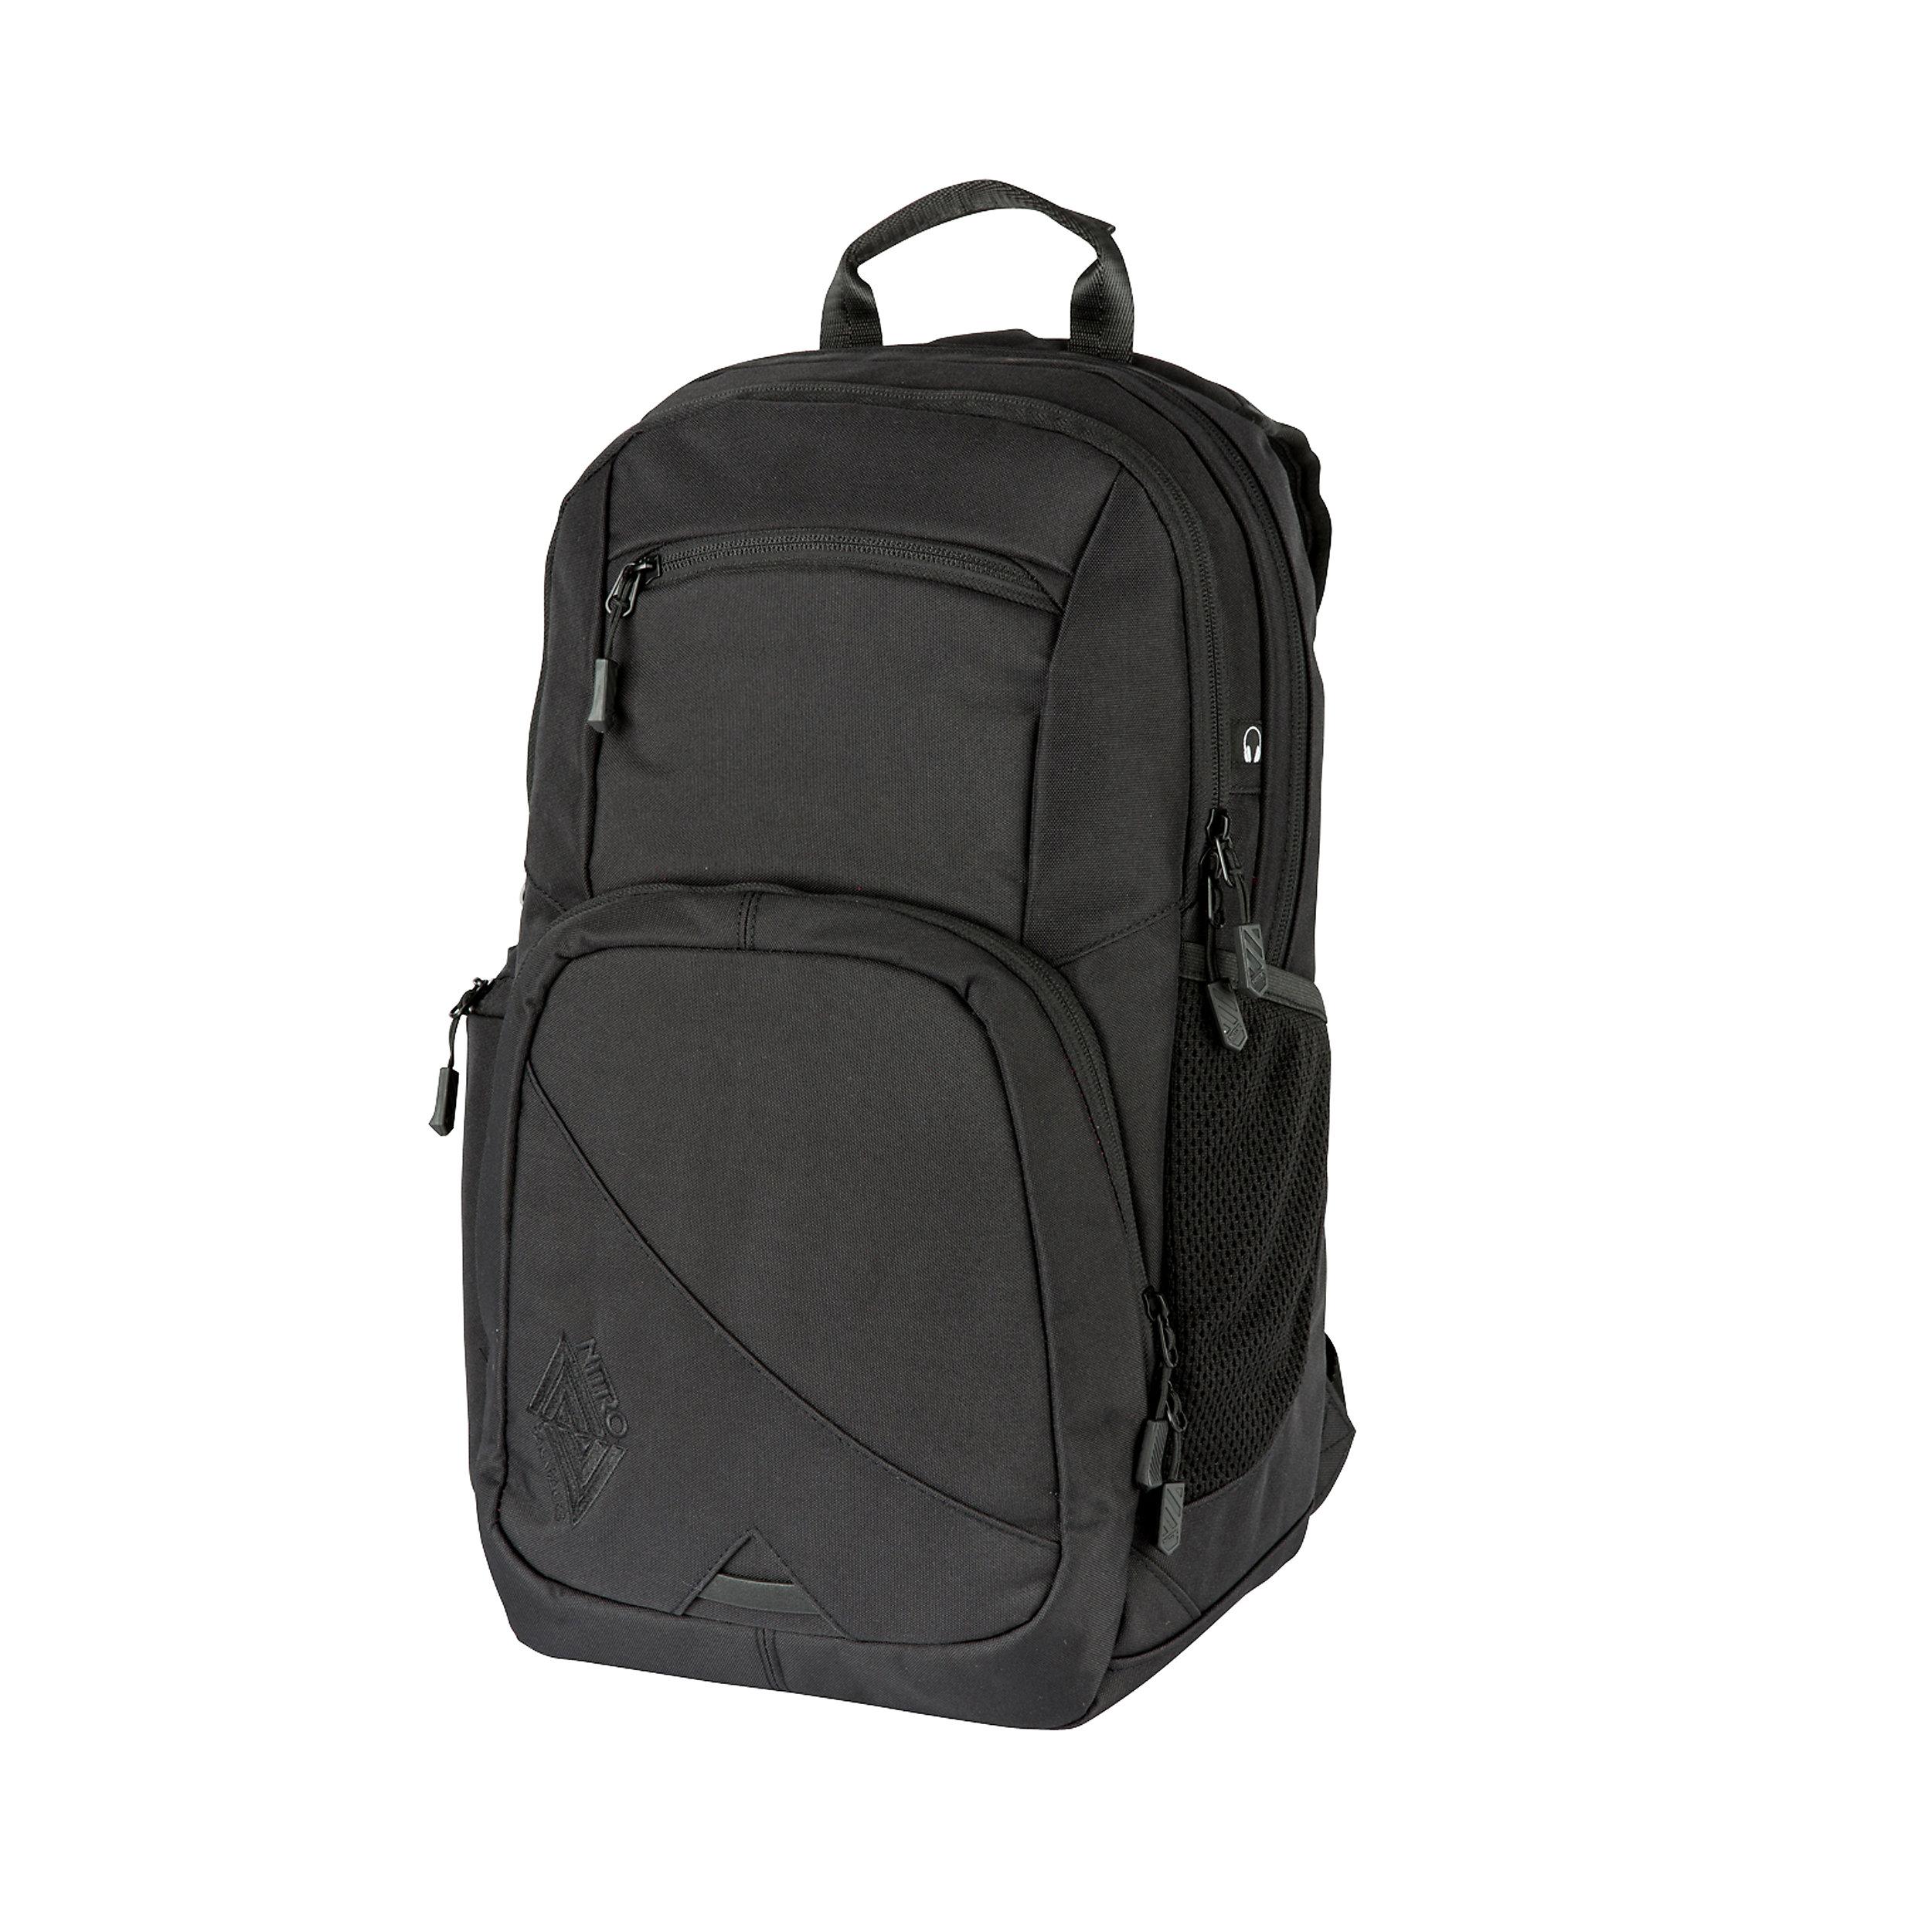 "Rucksack Stash 24 15"" Daypack Collection M"